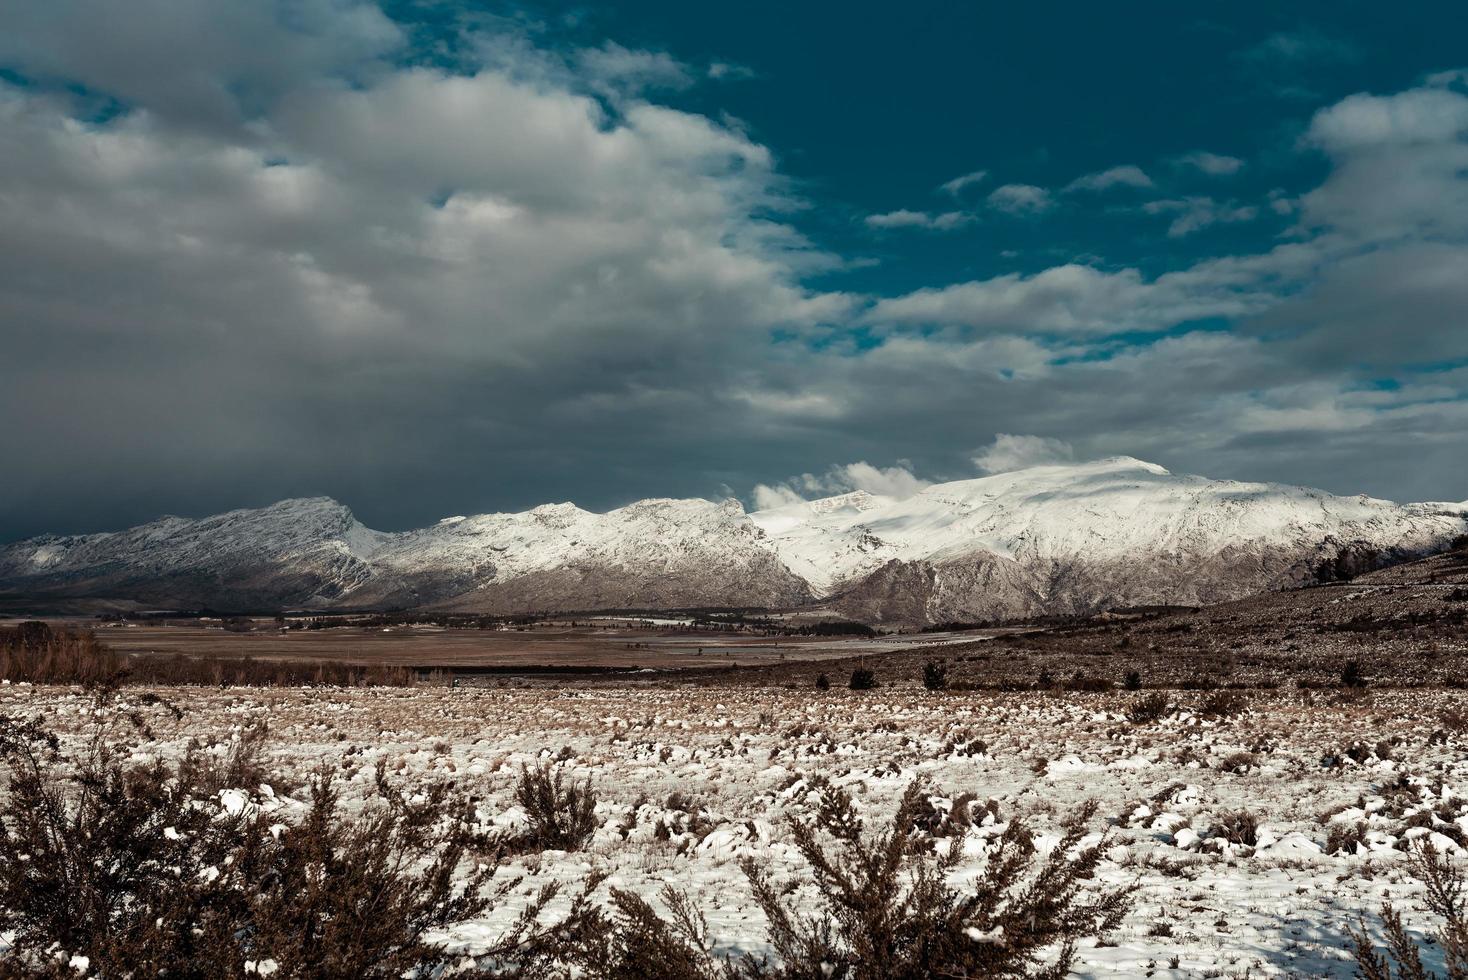 sneeuw die gras en bergen bedekt foto